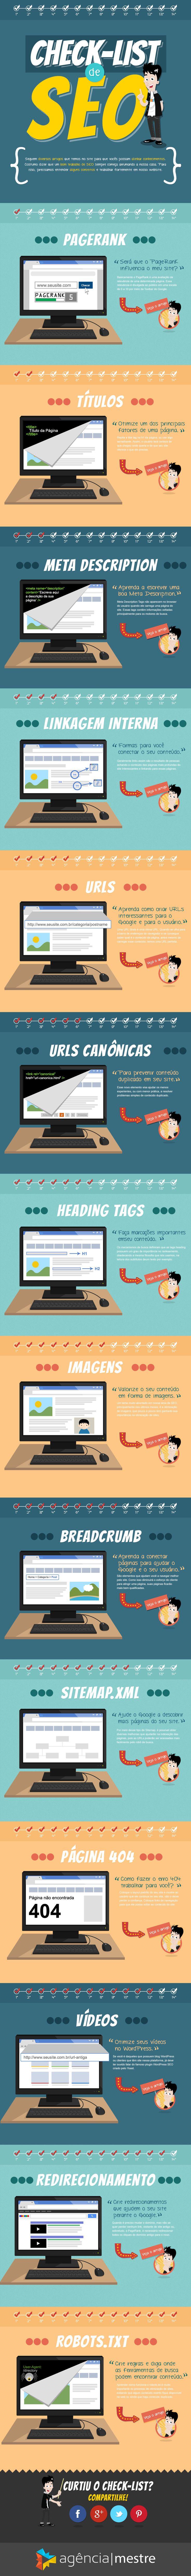 Infográfico - Checklist de SEO #infographic #seo